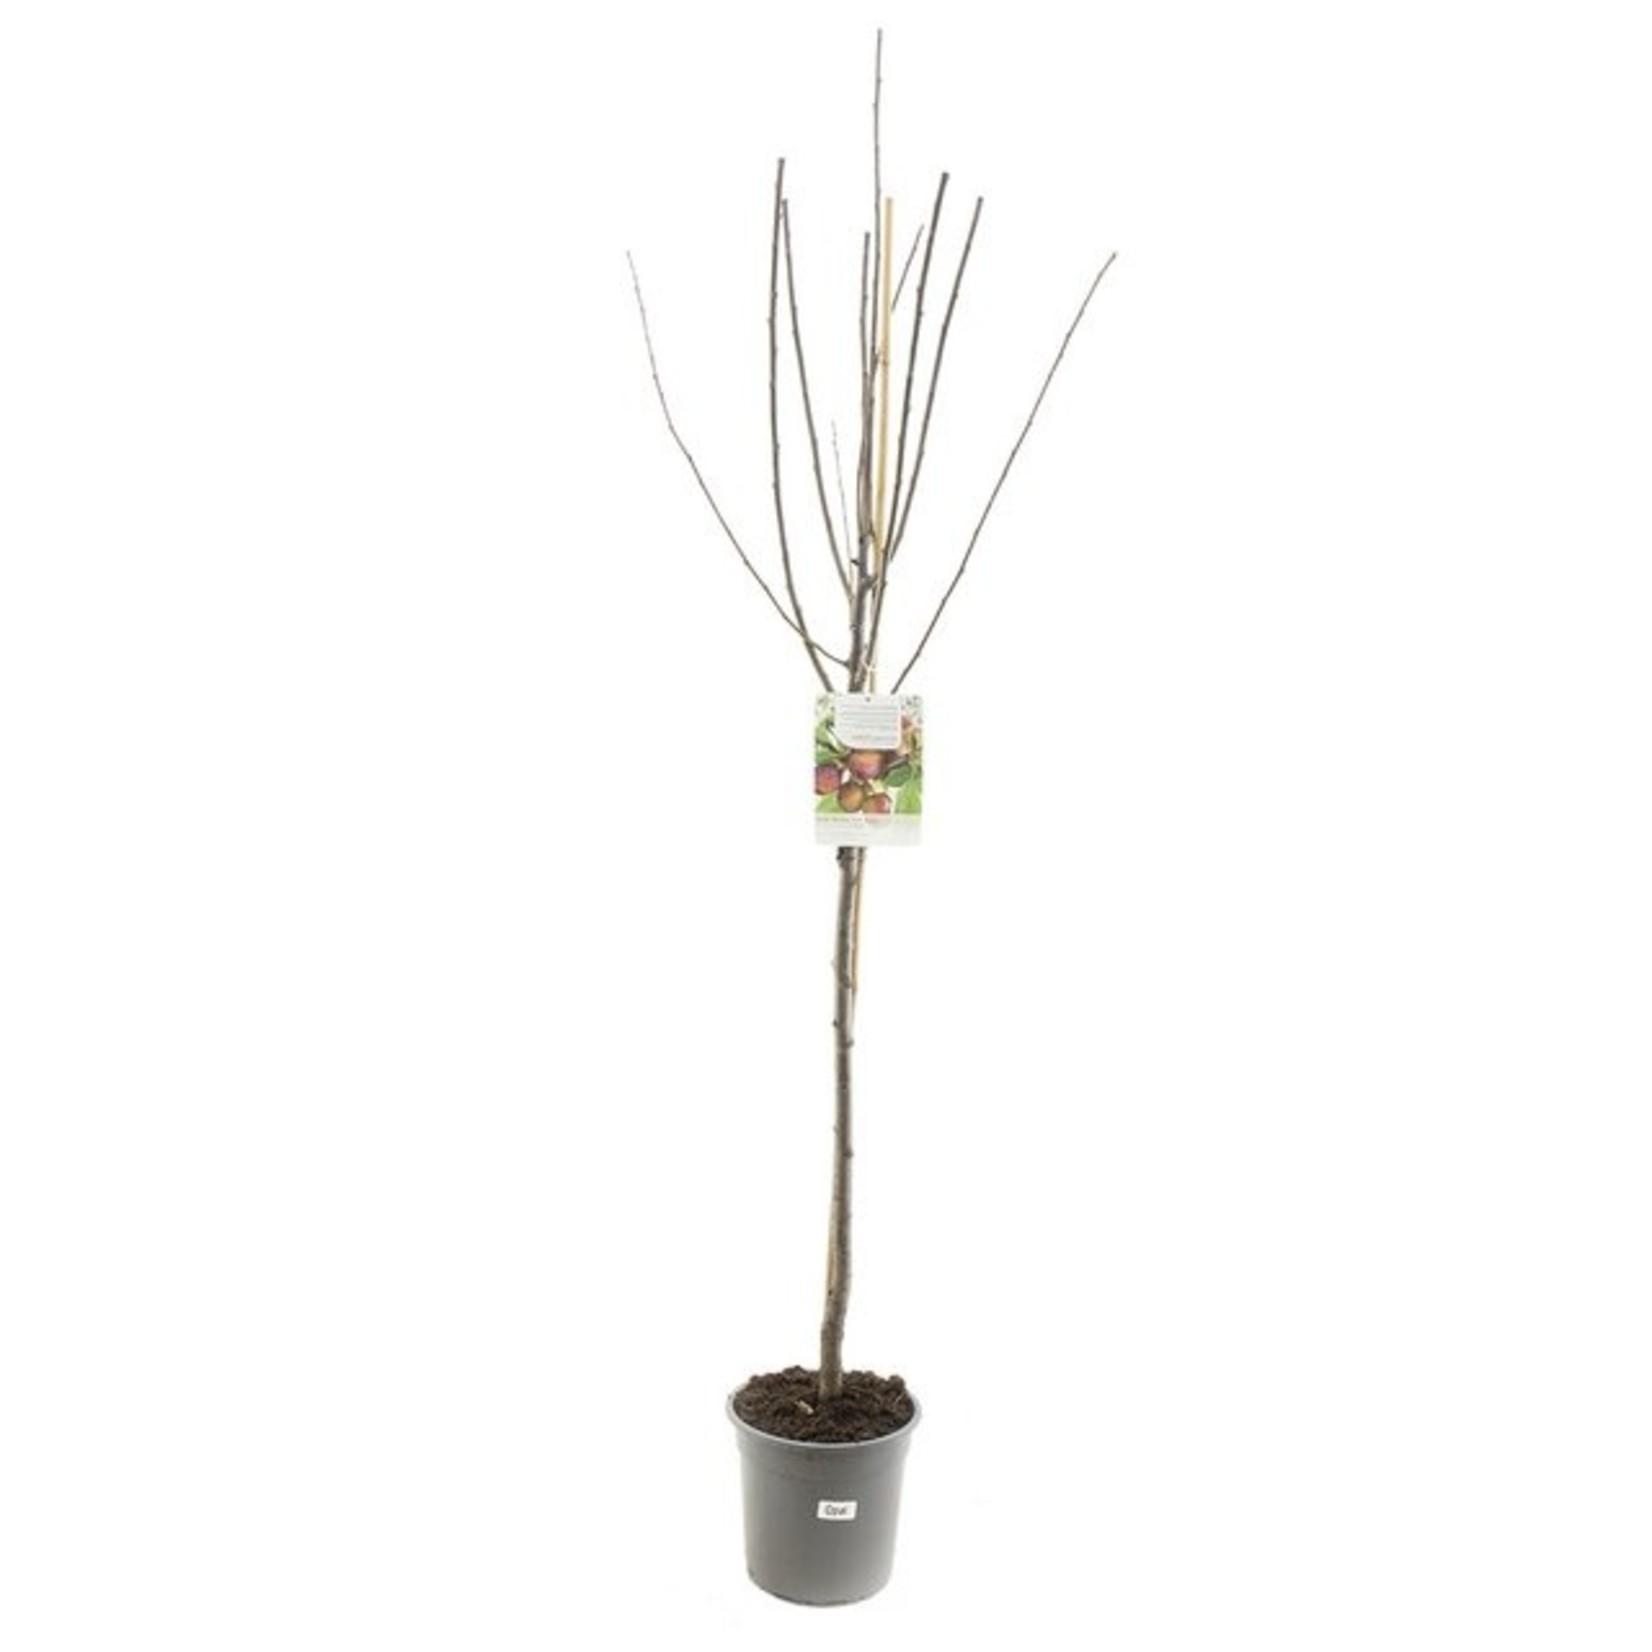 Hoogstam de Fruithof Prunus domestica 'Opal' (Pruim)